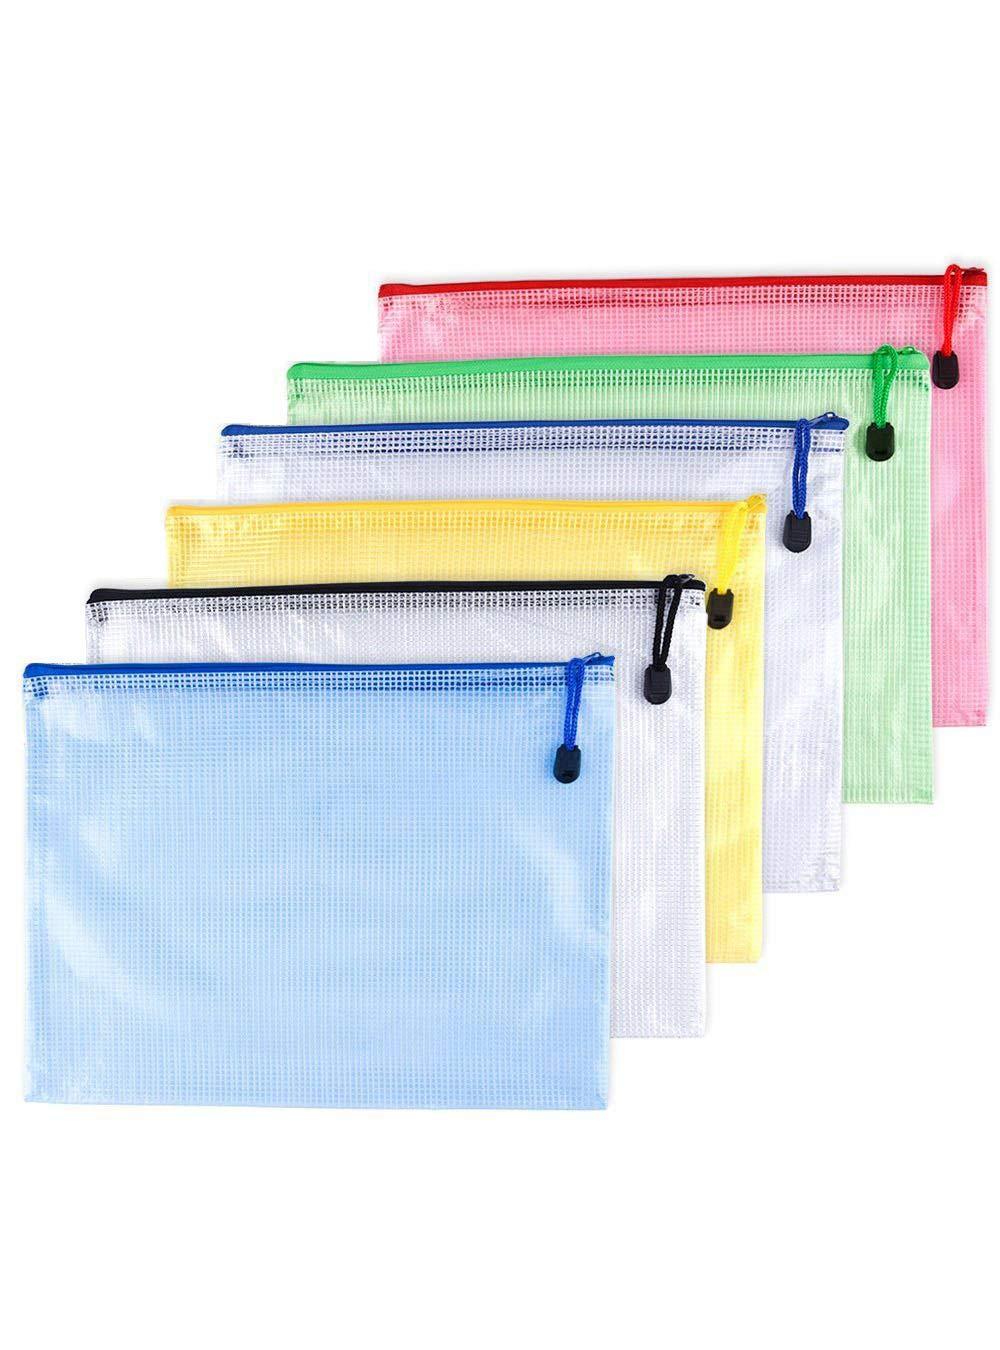 verde azul color blanco 6pcs camisa paquete cartera Pochette en PVC Zip documento carpeta//PVC School Office Magazine Document File Zippy Closure Folder Holder bag-noir Juane rojo A4